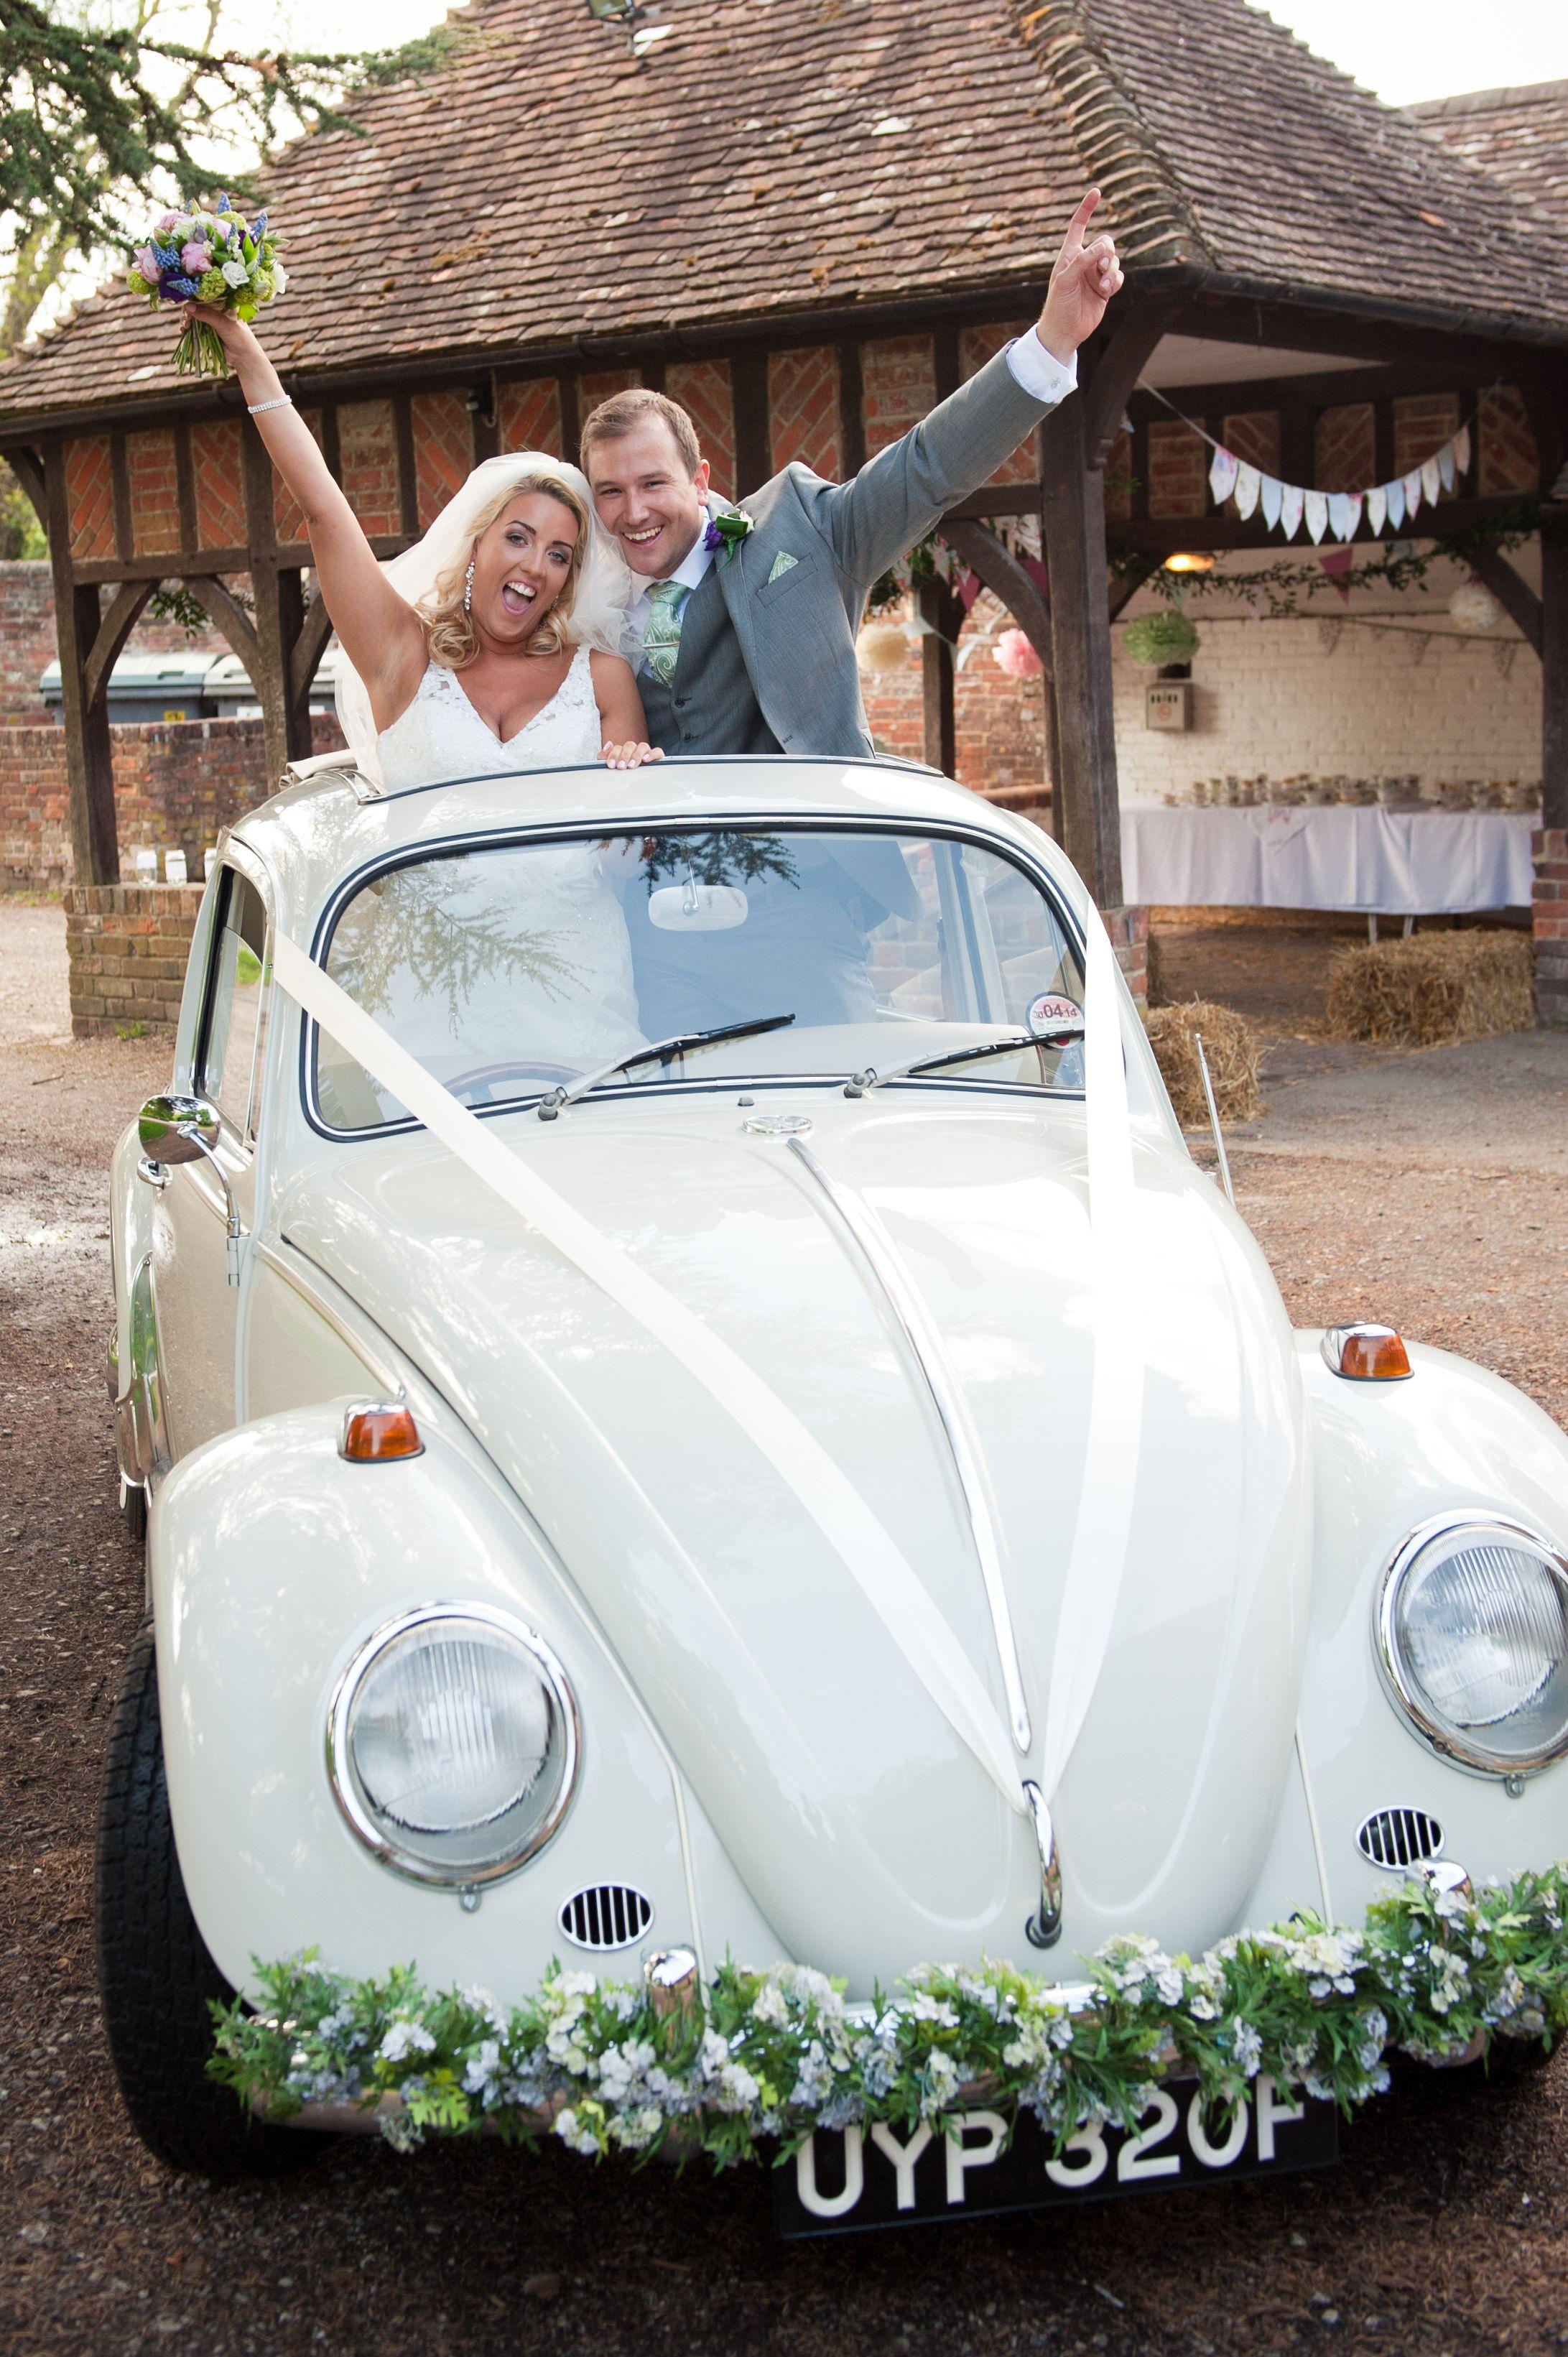 Http Punjabcarhire Com Contactus Html Contact Us 91 9810887582 Wedding Car Hire Car Hire Luxury Car Rental